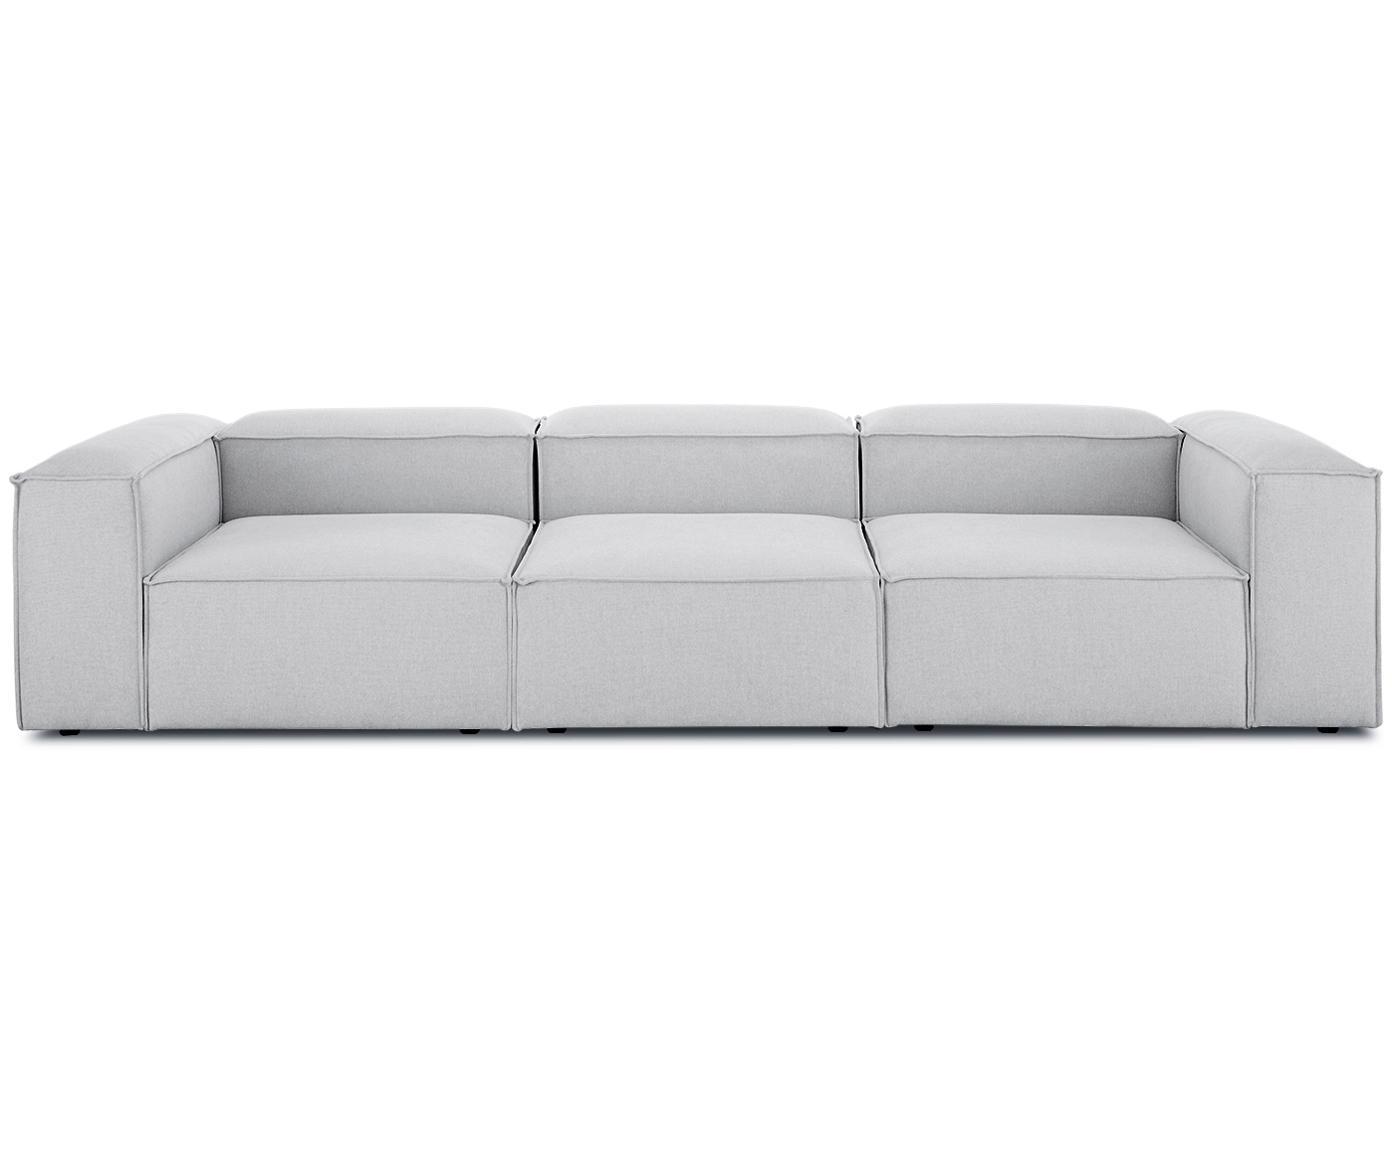 Modulares Sofa Lennon (4-Sitzer), Bezug: Polyester 35.000 Scheuert, Gestell: Massives Kiefernholz, Spe, Webstoff Hellgrau, B 326 x T 119 cm